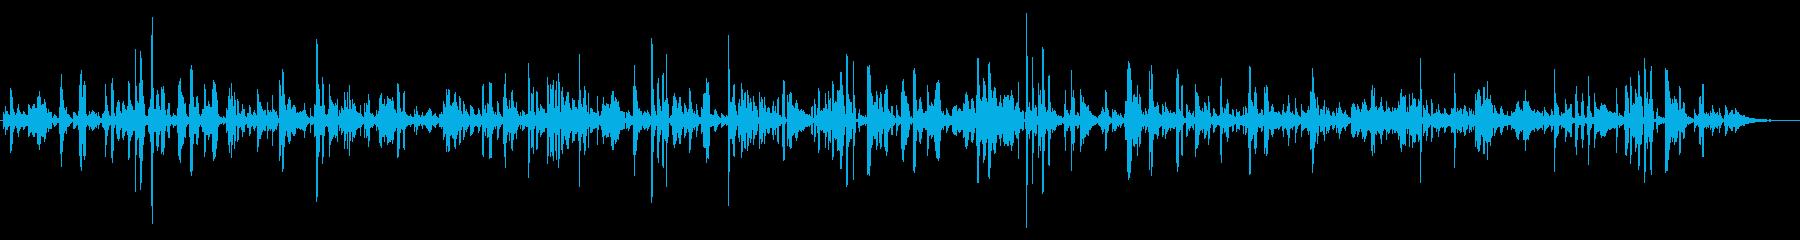 JAZZ★お洒落な店で流れるムードBGMの再生済みの波形